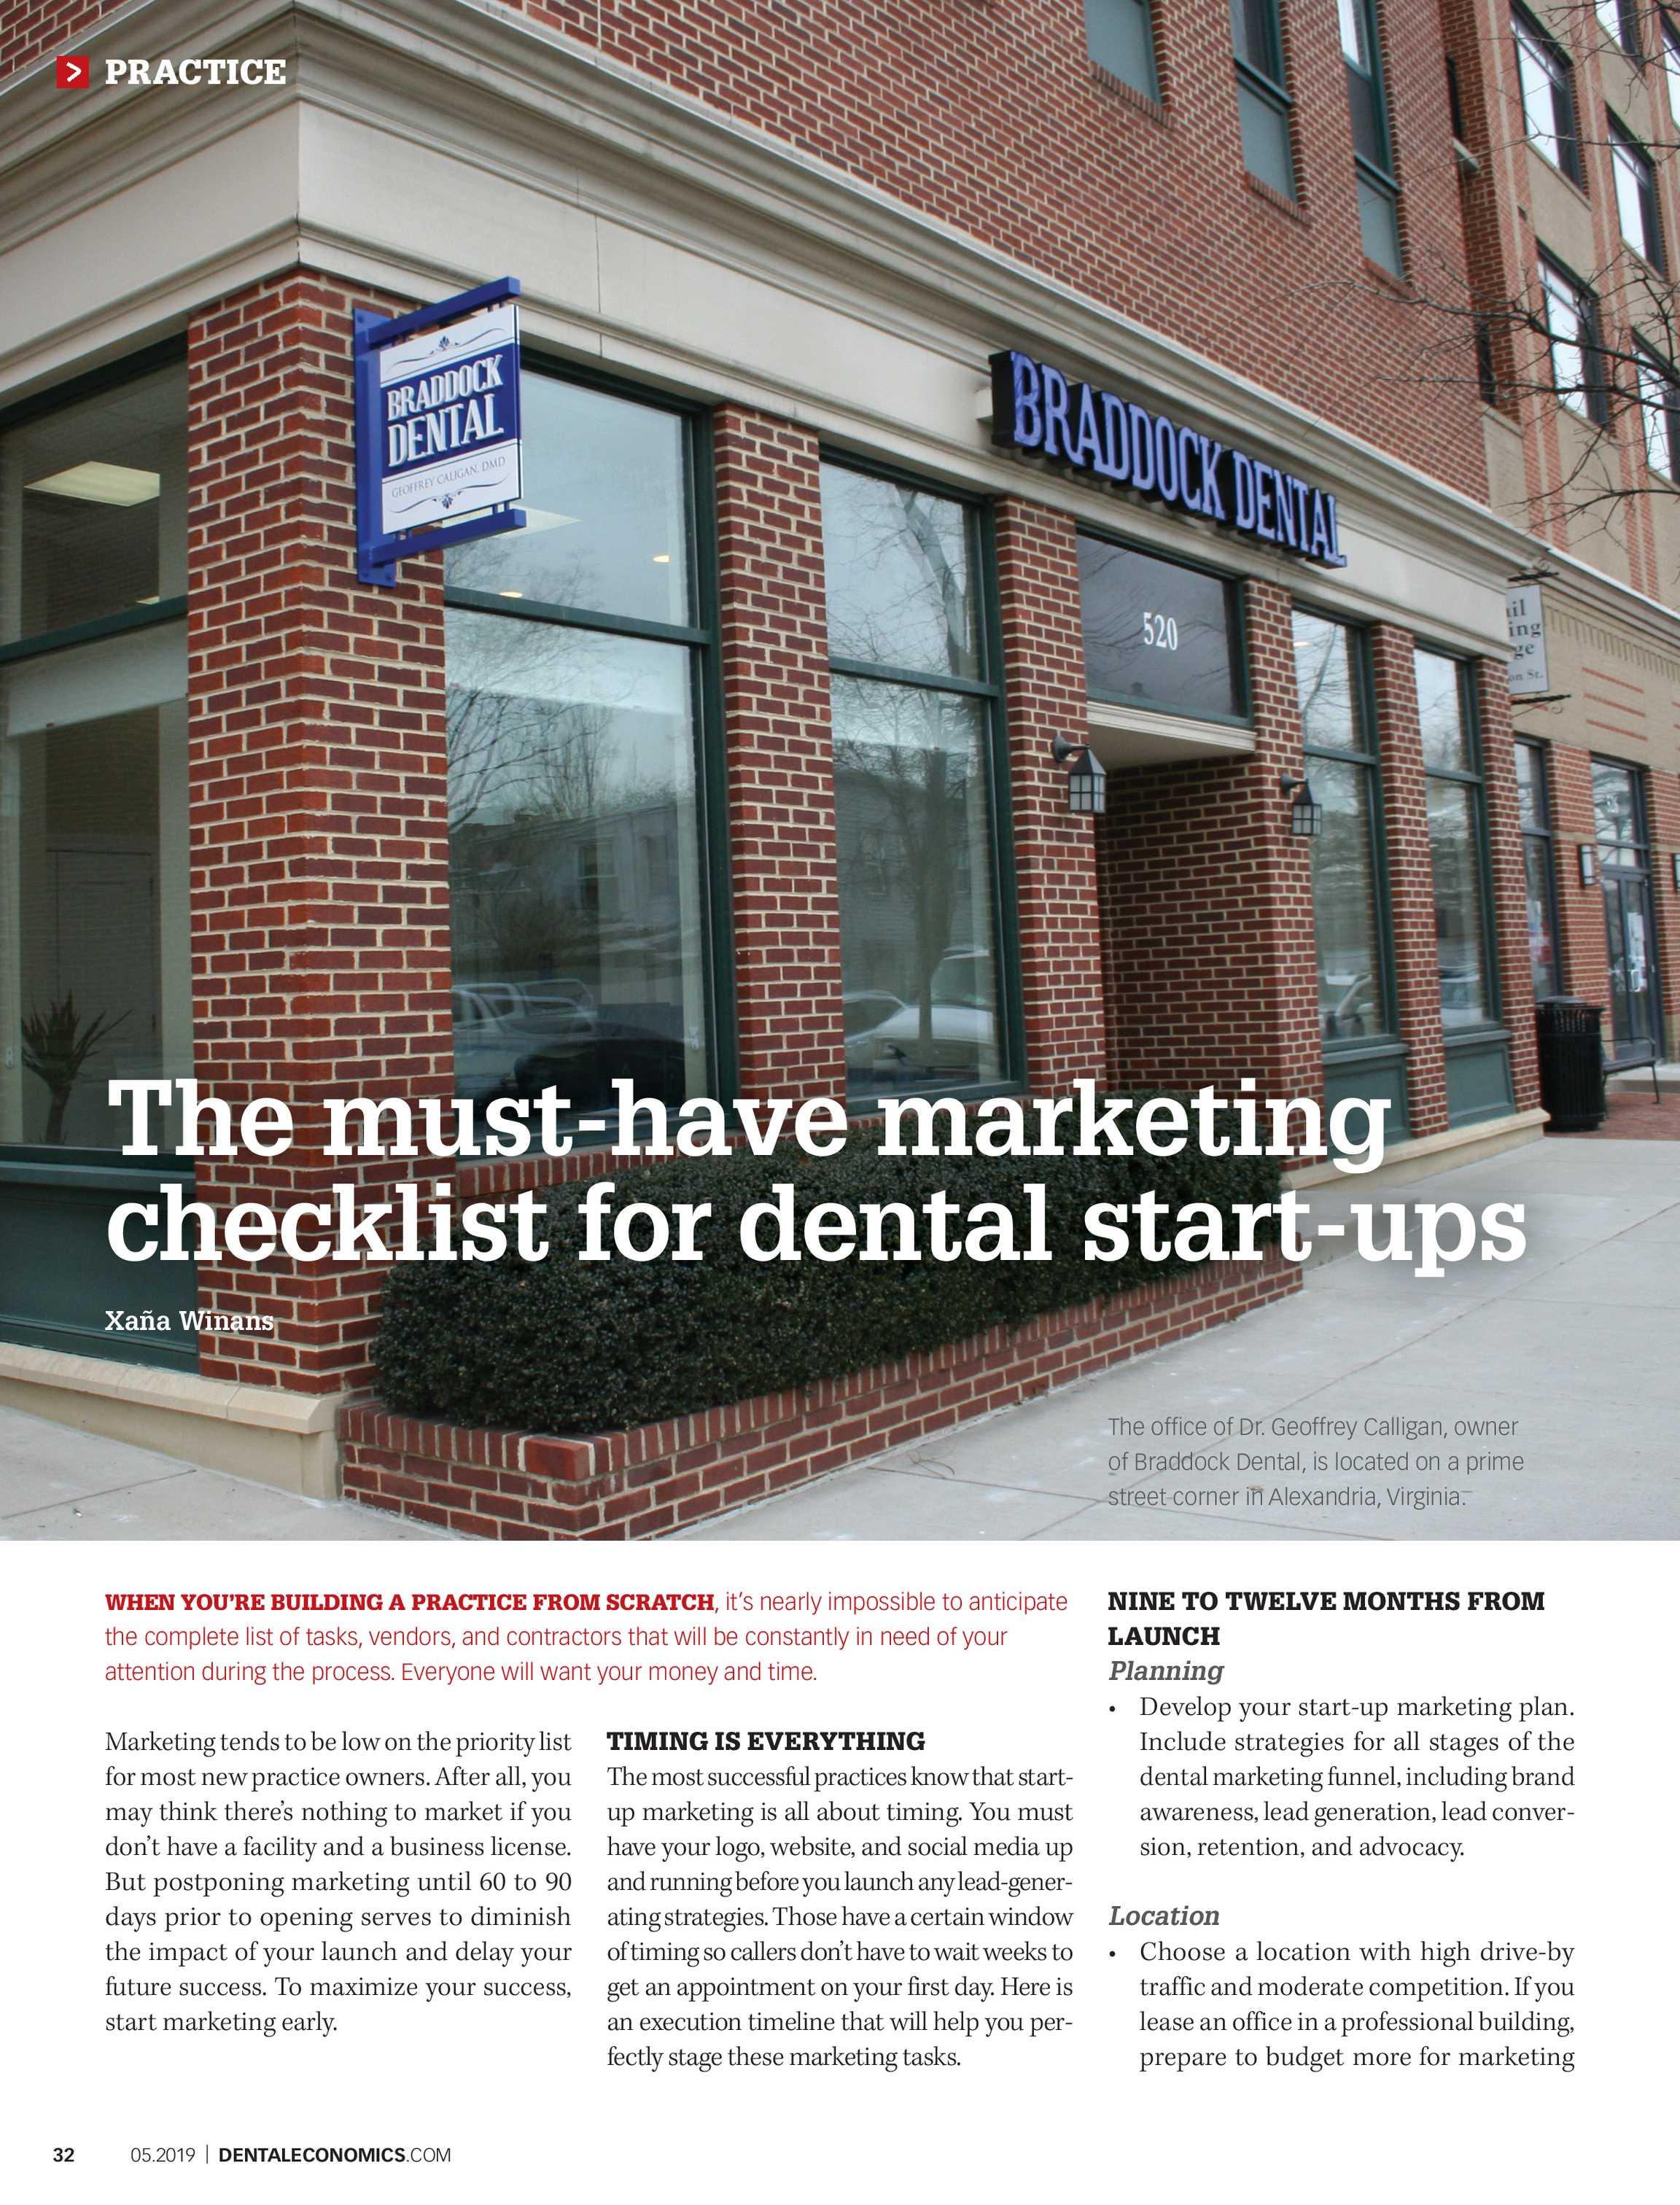 Dental Economics - May 2019 - page 32